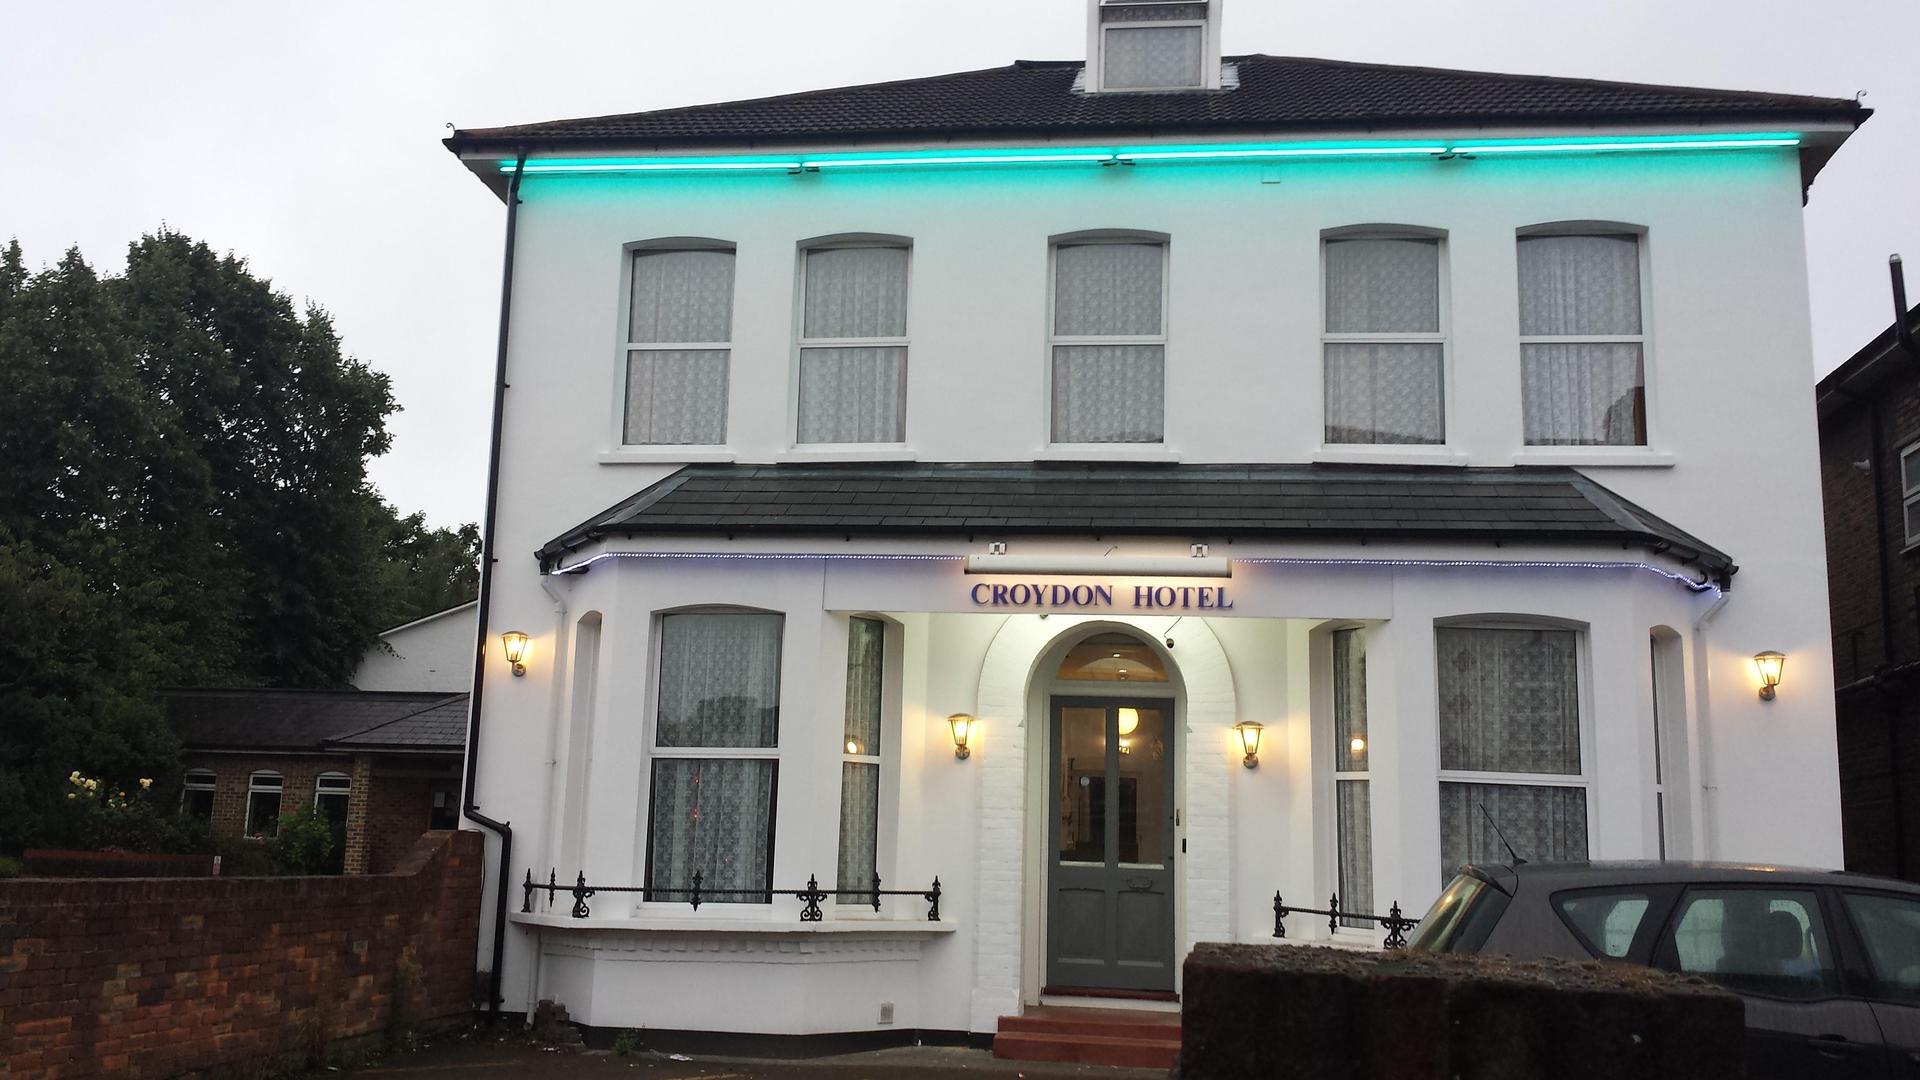 Croydon Hotel